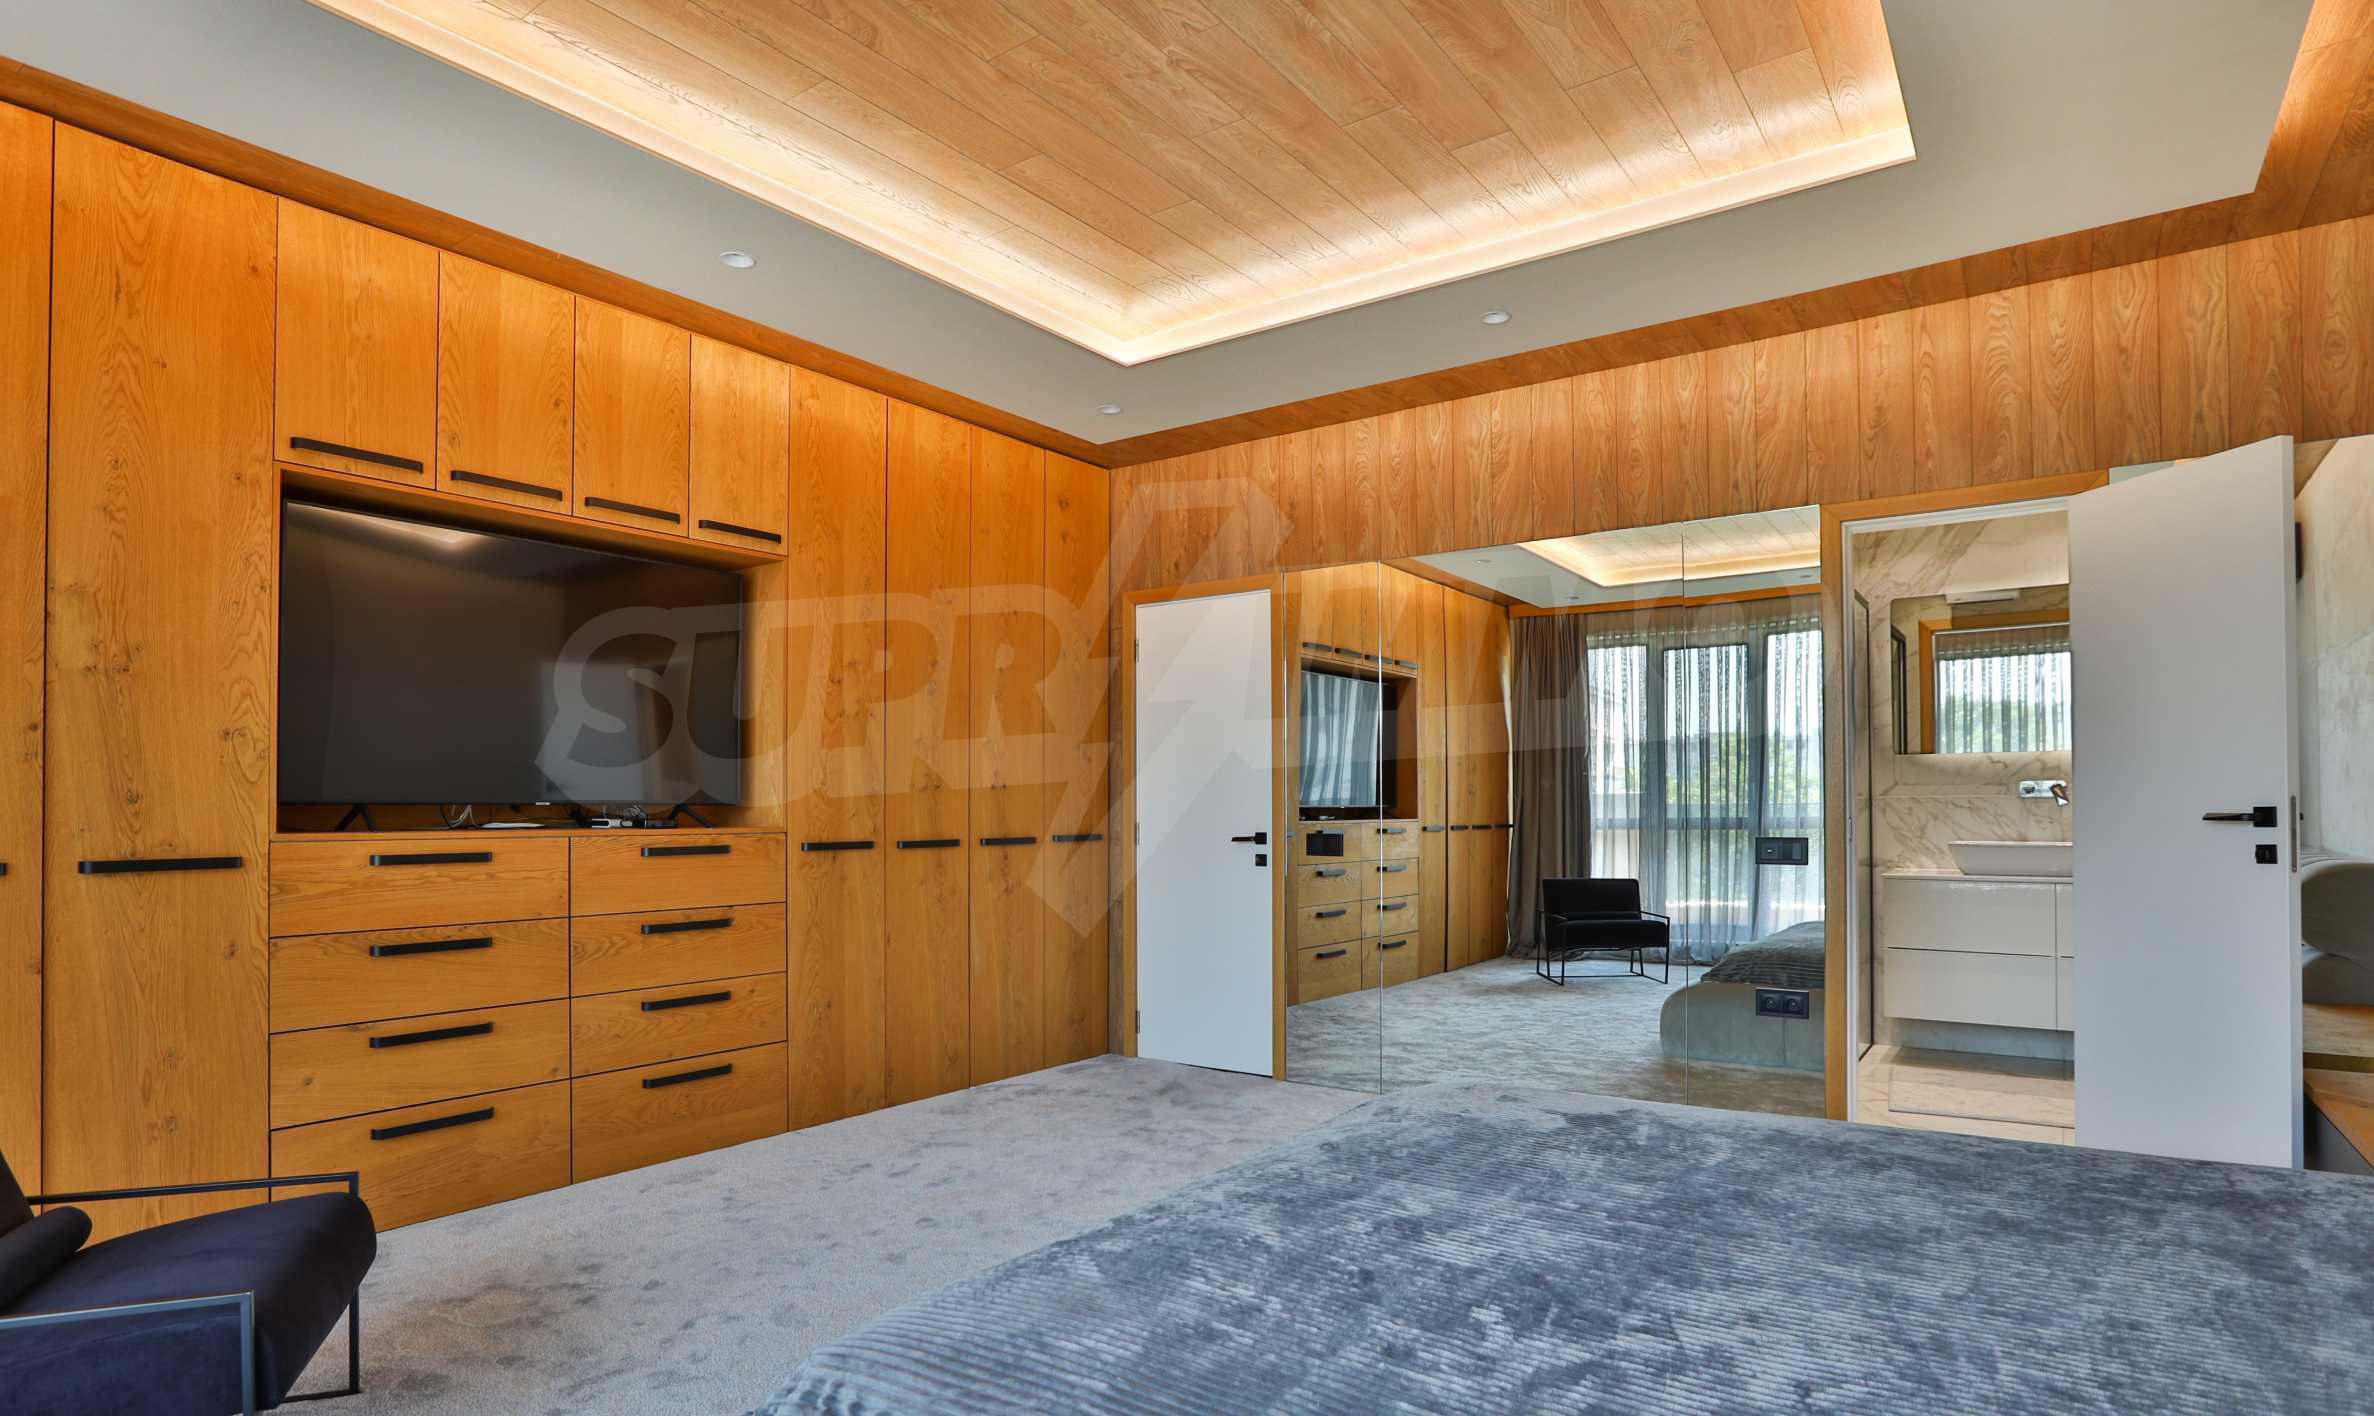 Дизайнерски обзаведен многостаен апартамент 9